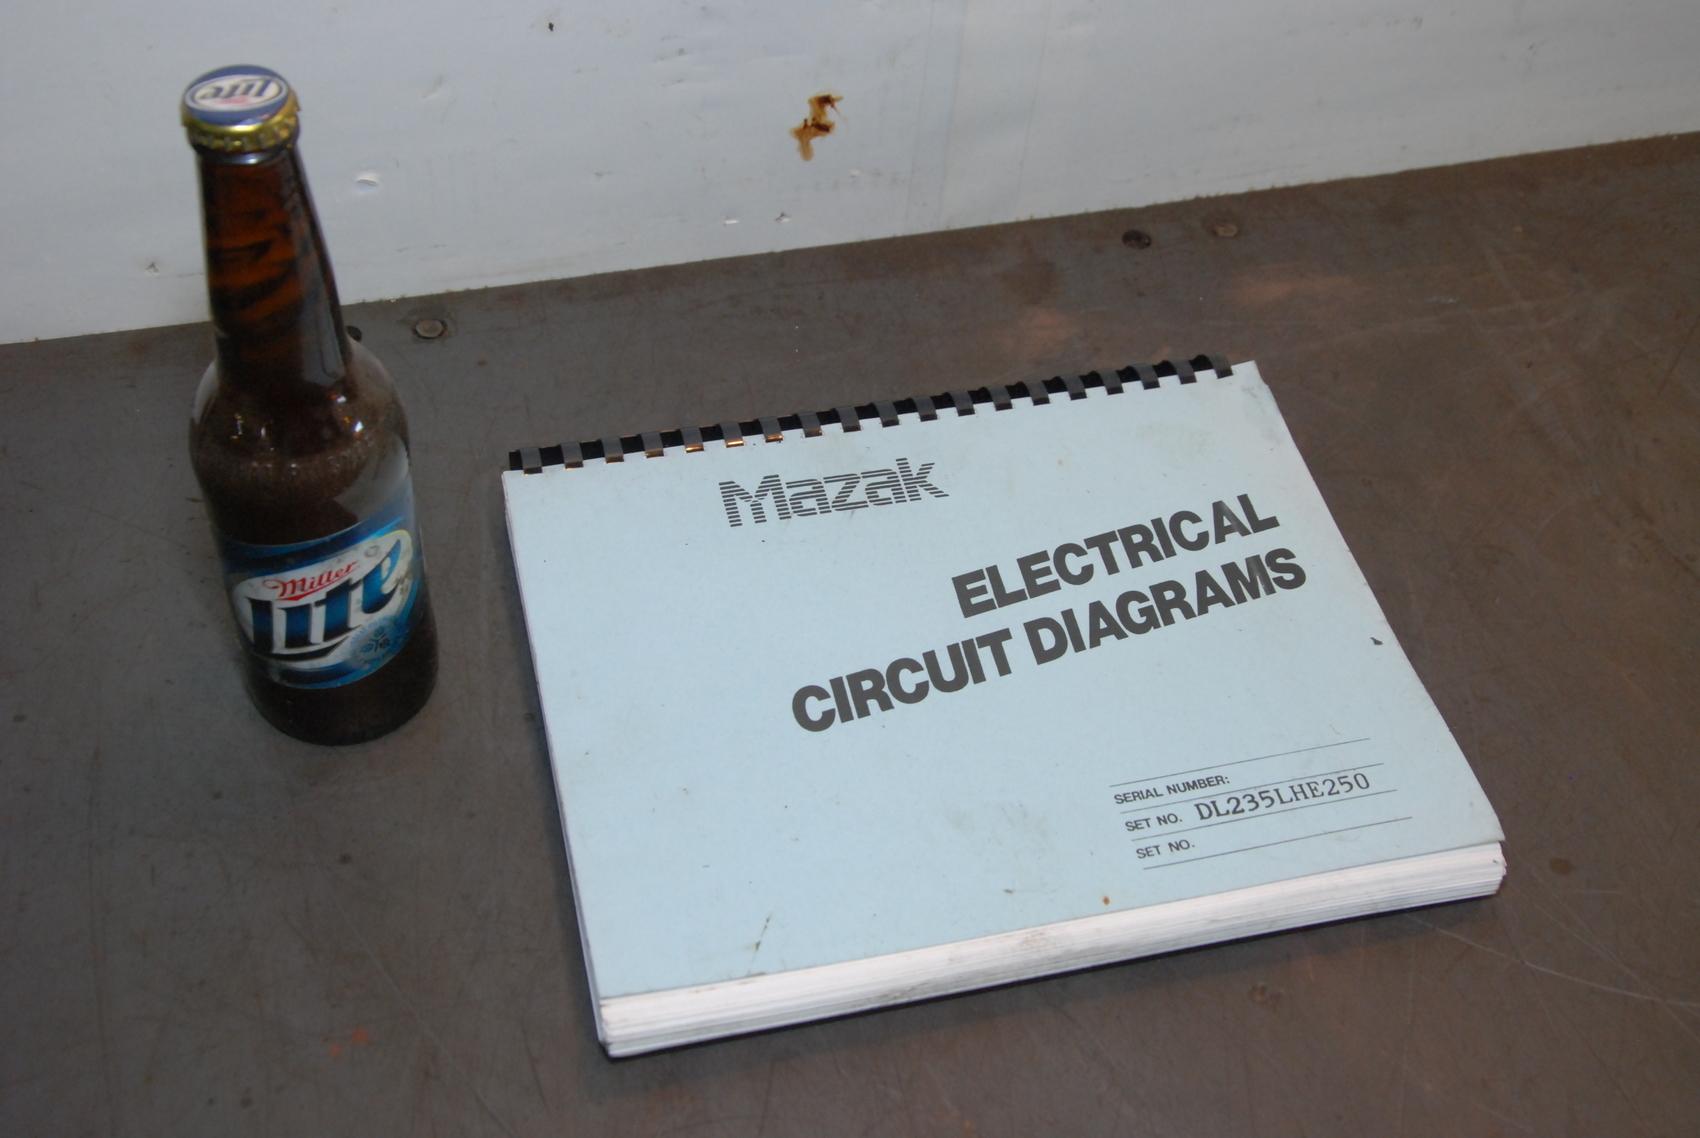 Mazak Electrical Circuit Diagrams,Set:DL235LHE250